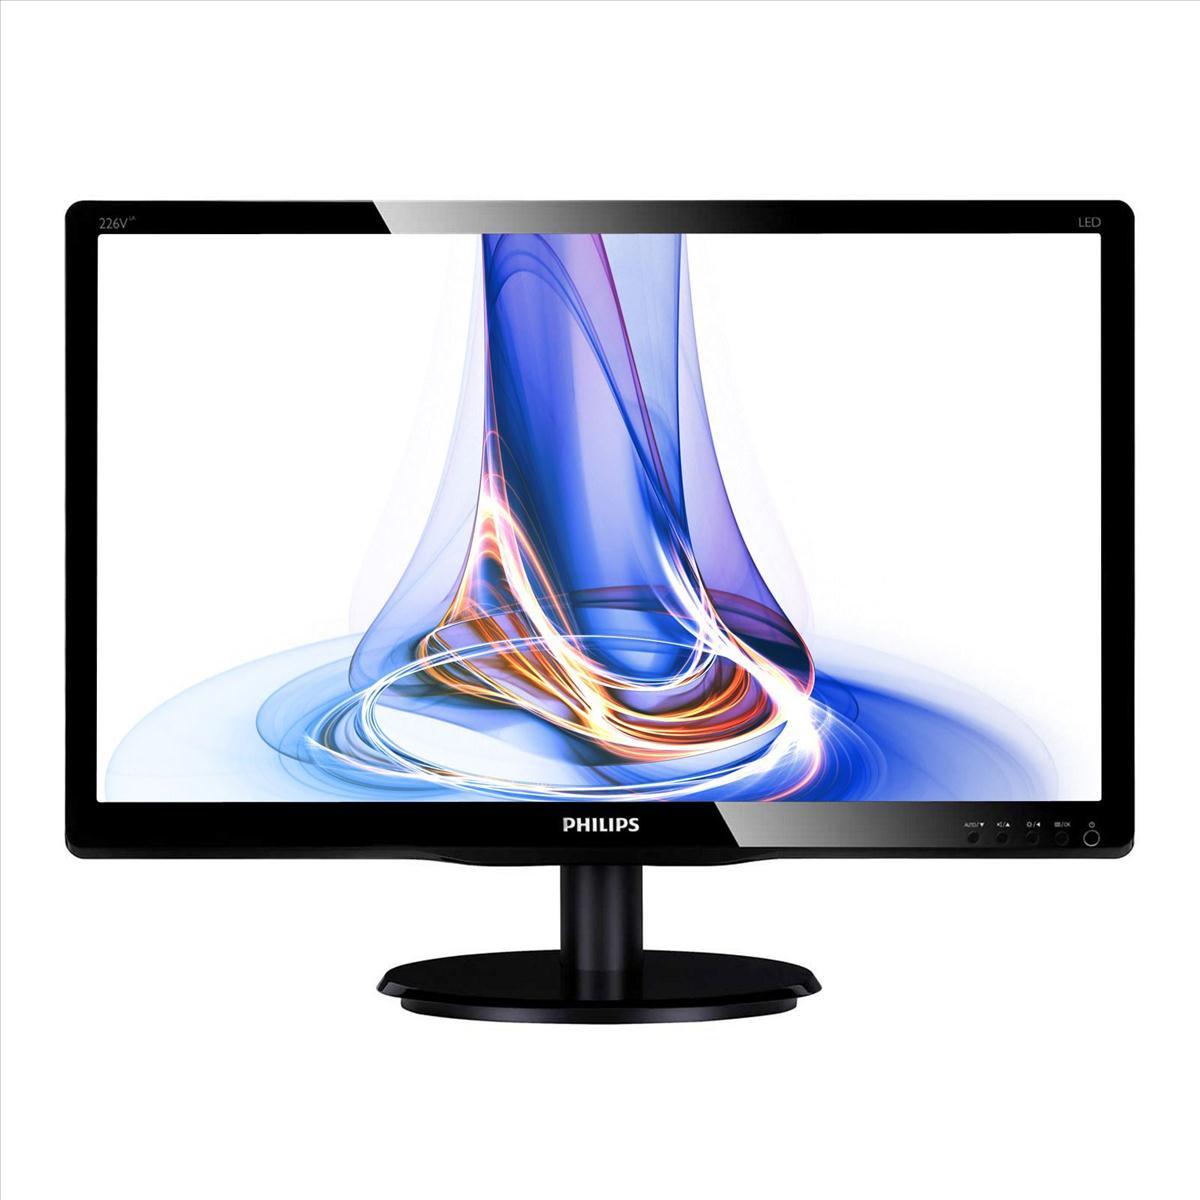 Philips 226V4LAB/00 cheap Full HD 1080p LED monitor £73.99 @ CCLOnline